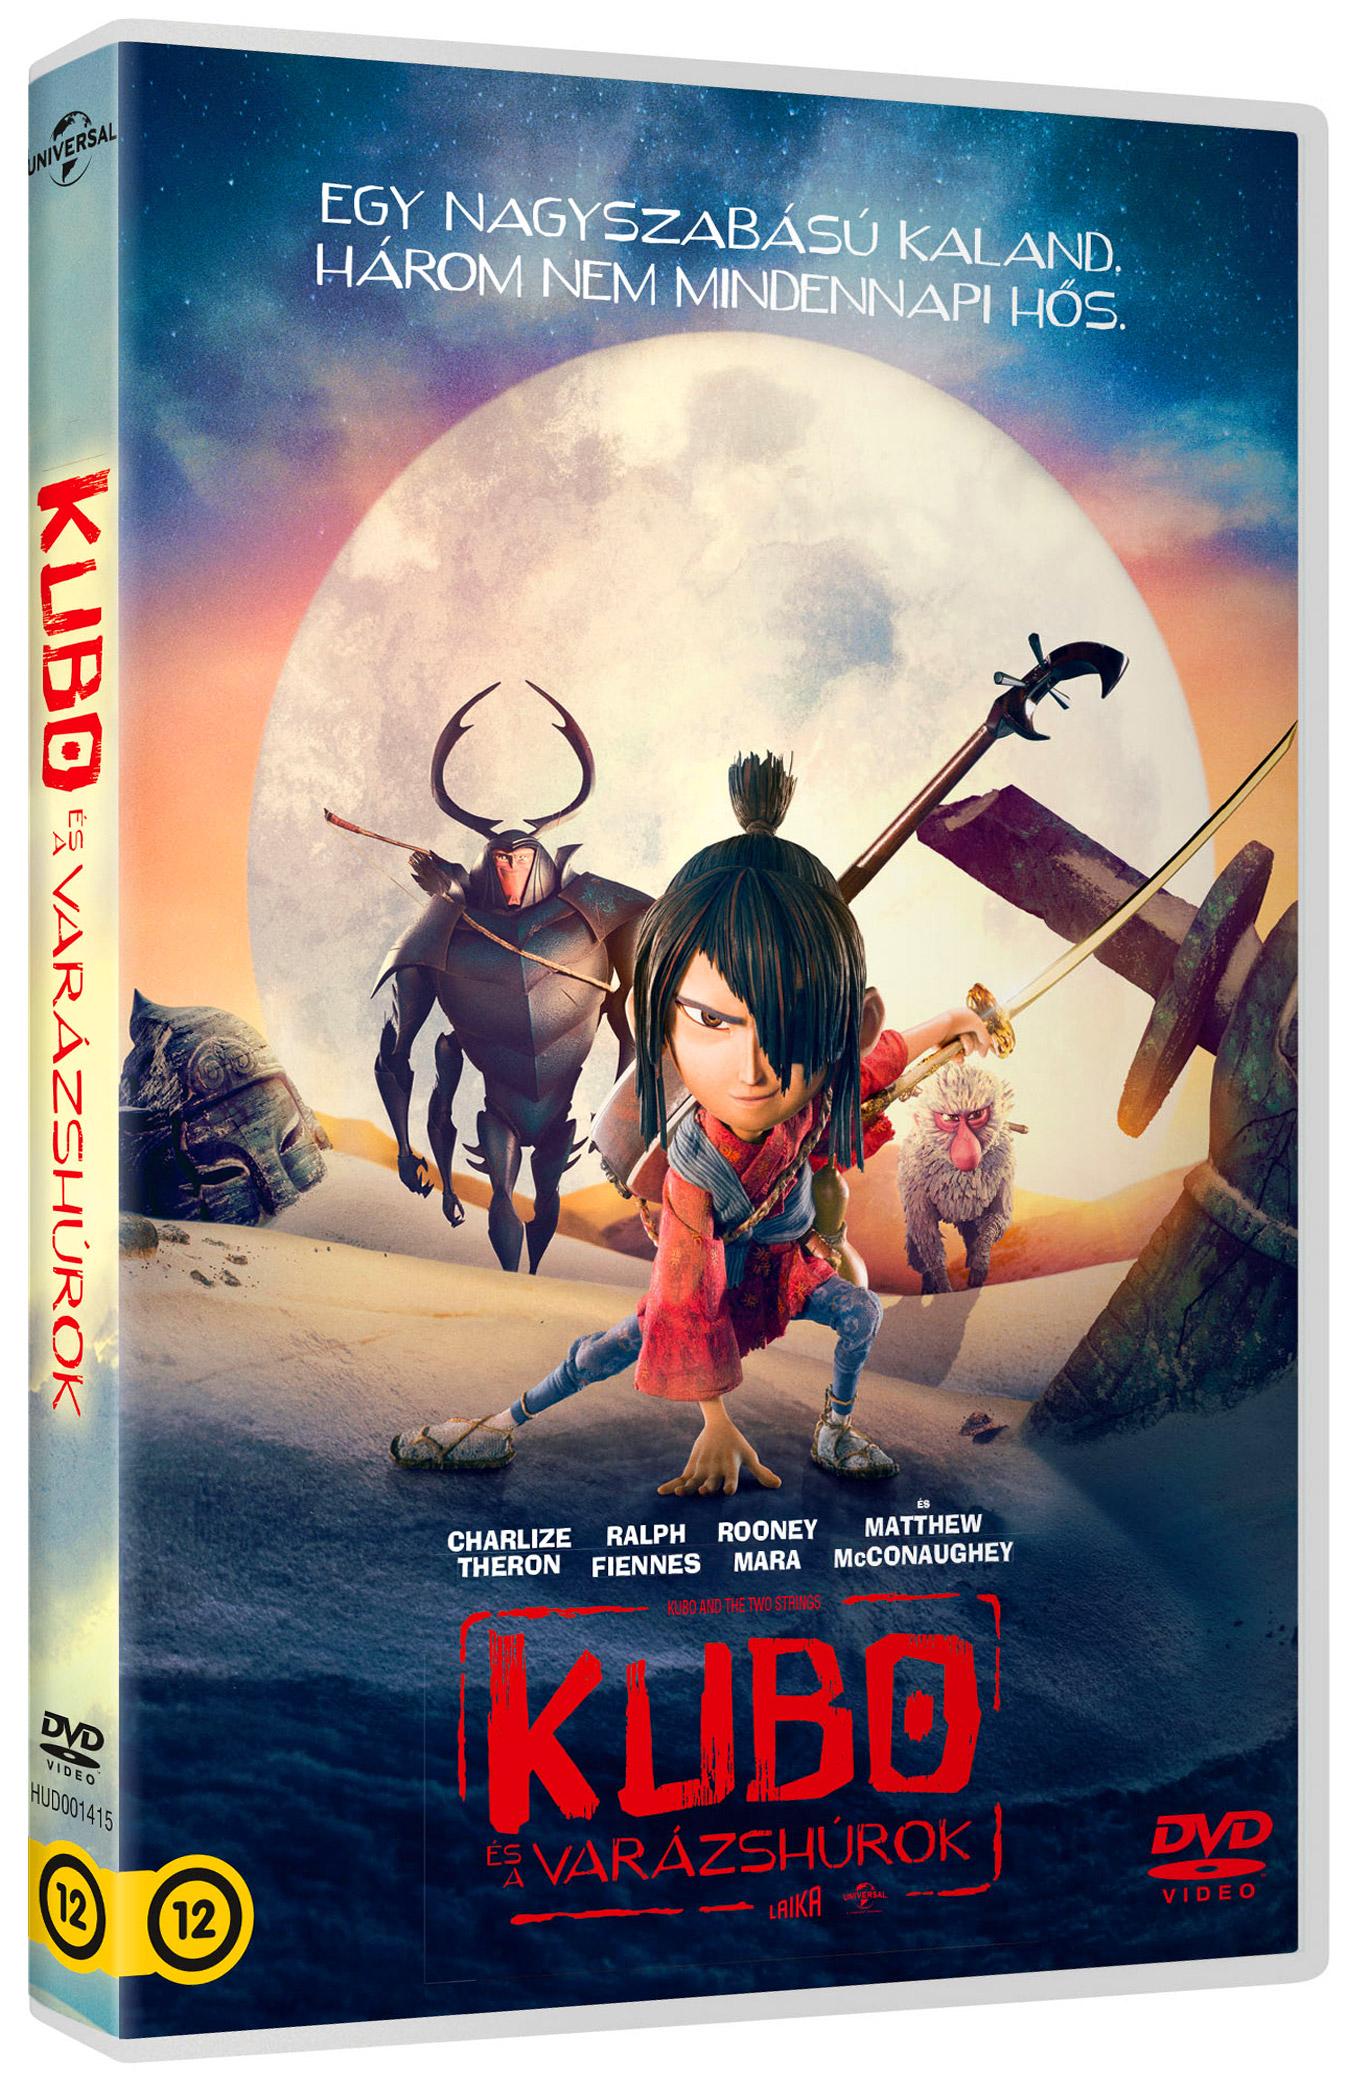 Kubo és a varázshúrok DVD